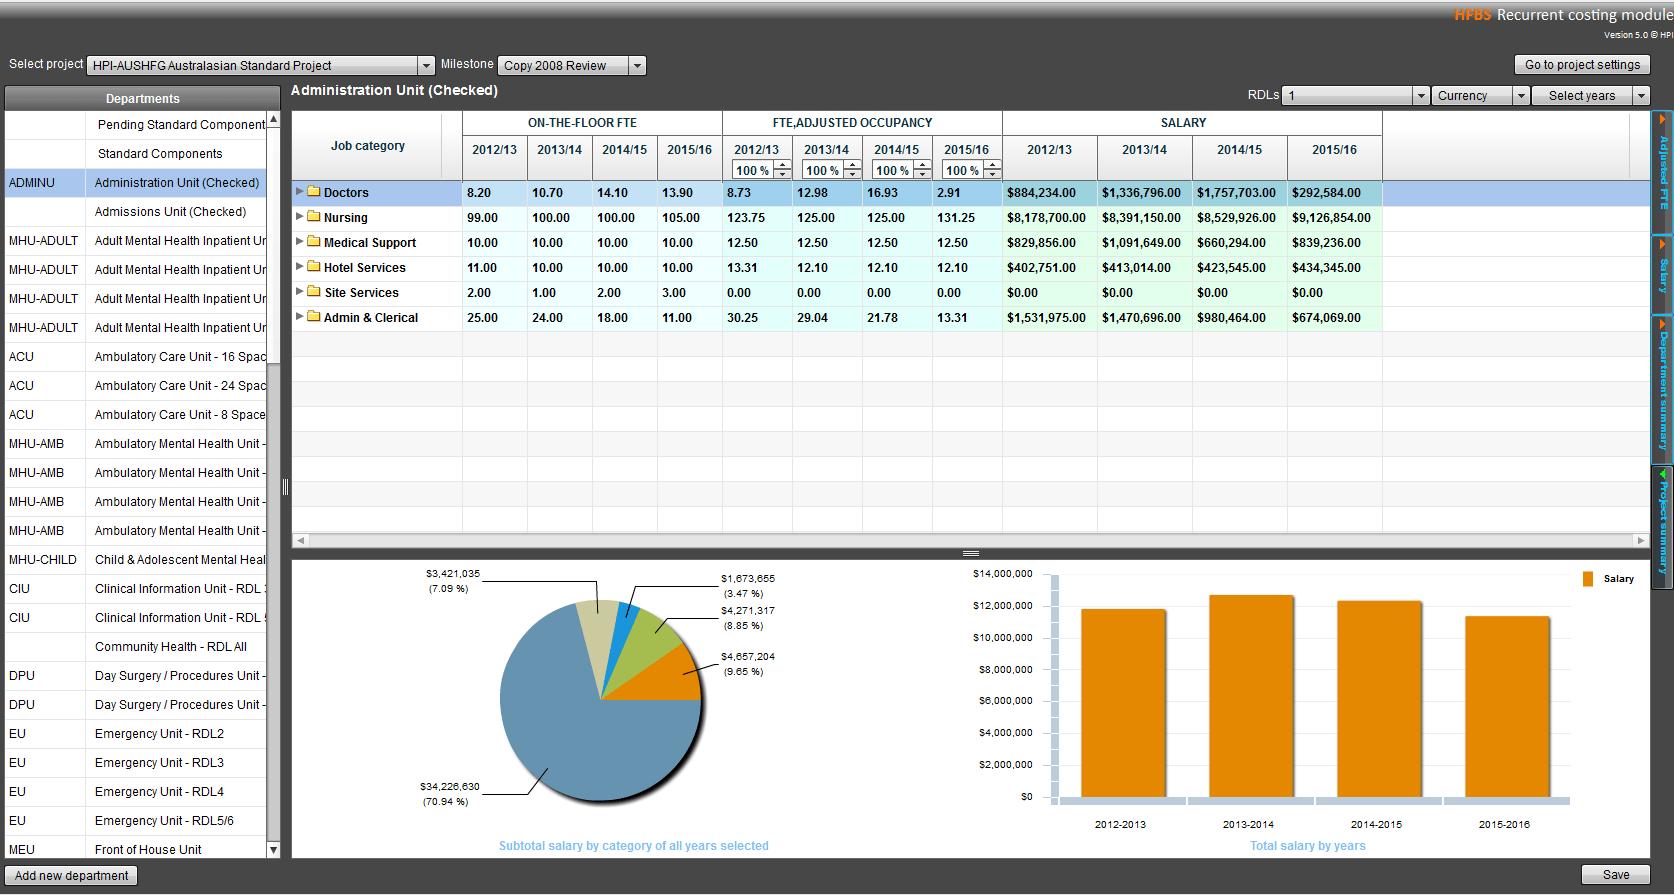 rcm-costing-summary-charts